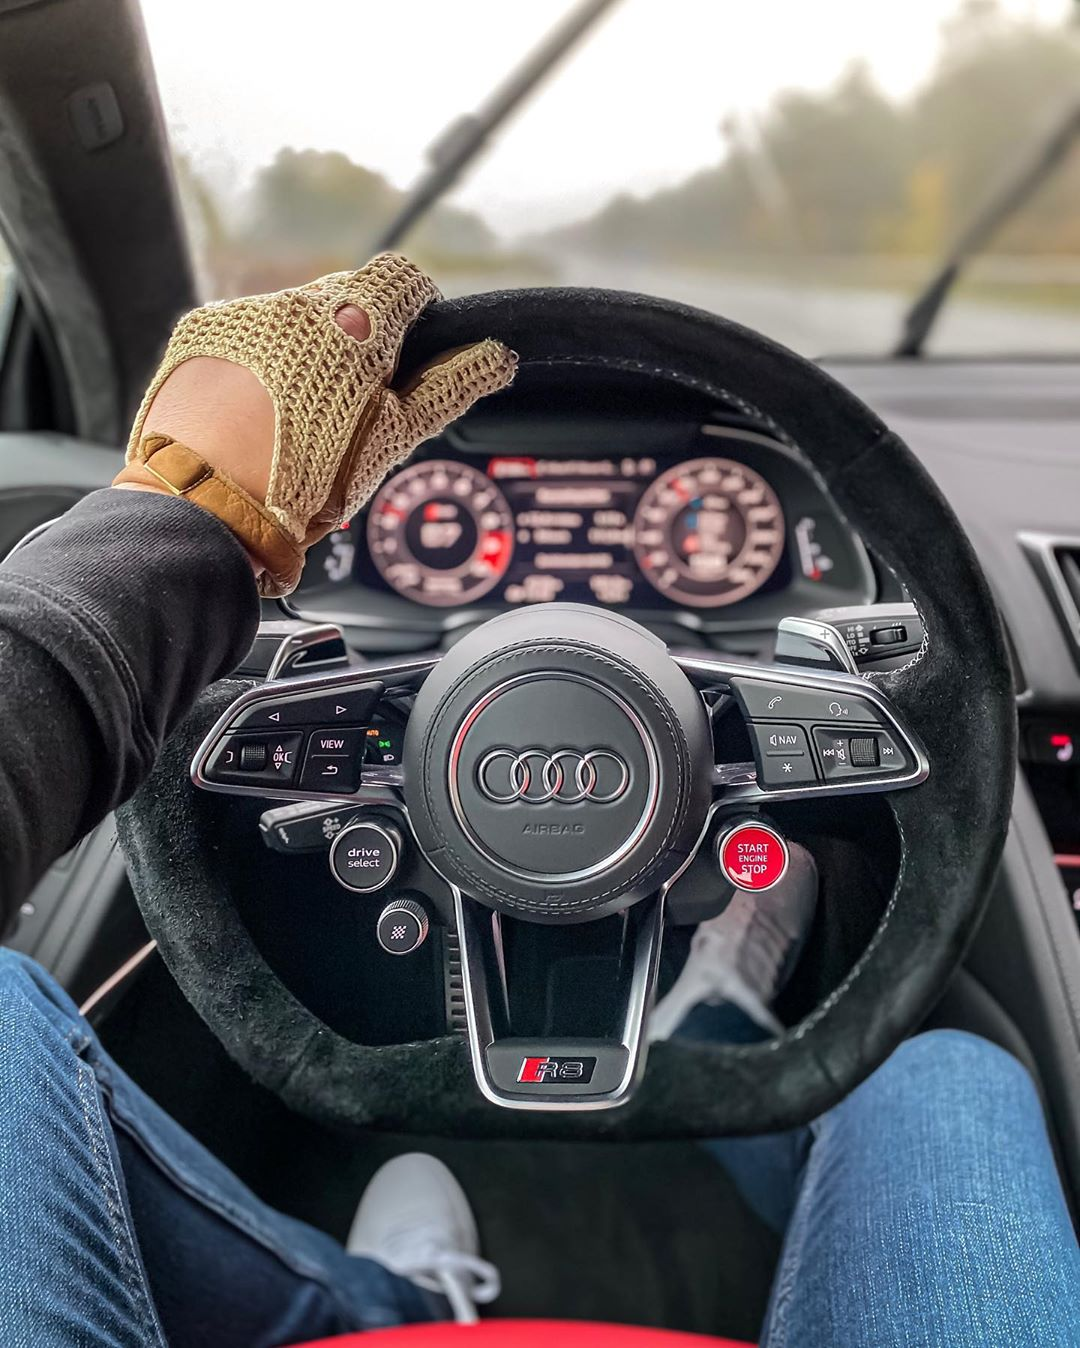 This weather🌧🤦♂️…R8 already got 5.000 km on the clock though😳 #iphone11pro #iphone11  #audir8 #audisport #audir8facelift #audir8v10 #r8 #r8facelift #r8v10 #automanntv #automannsgarage